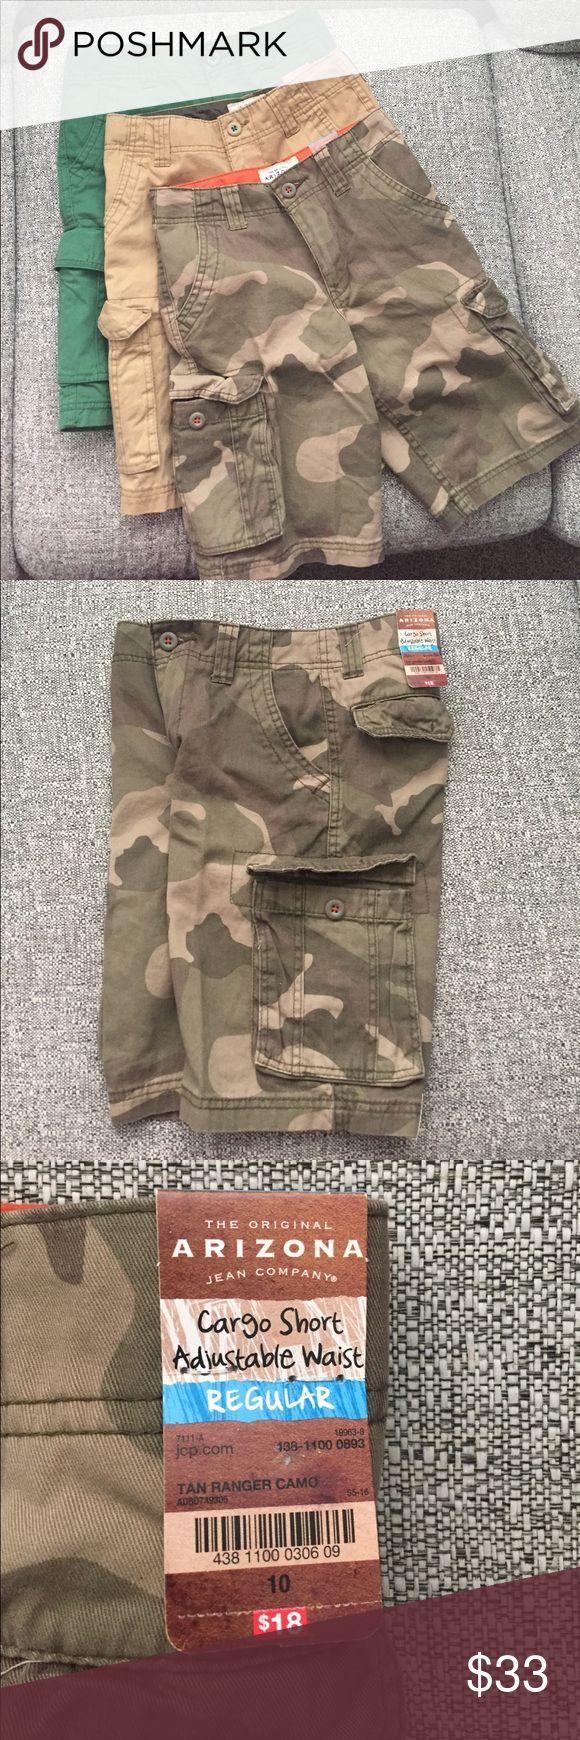 NWT-Bundle Boys Cargo Shorts Brand new! Cargo shorts, adjustable waist, regular fit. Camo, Khaki and Green. Great staples for a young mans wardrobe 🏀⚽️🏈⚾️ Arizona Jean Company Bottoms Shorts